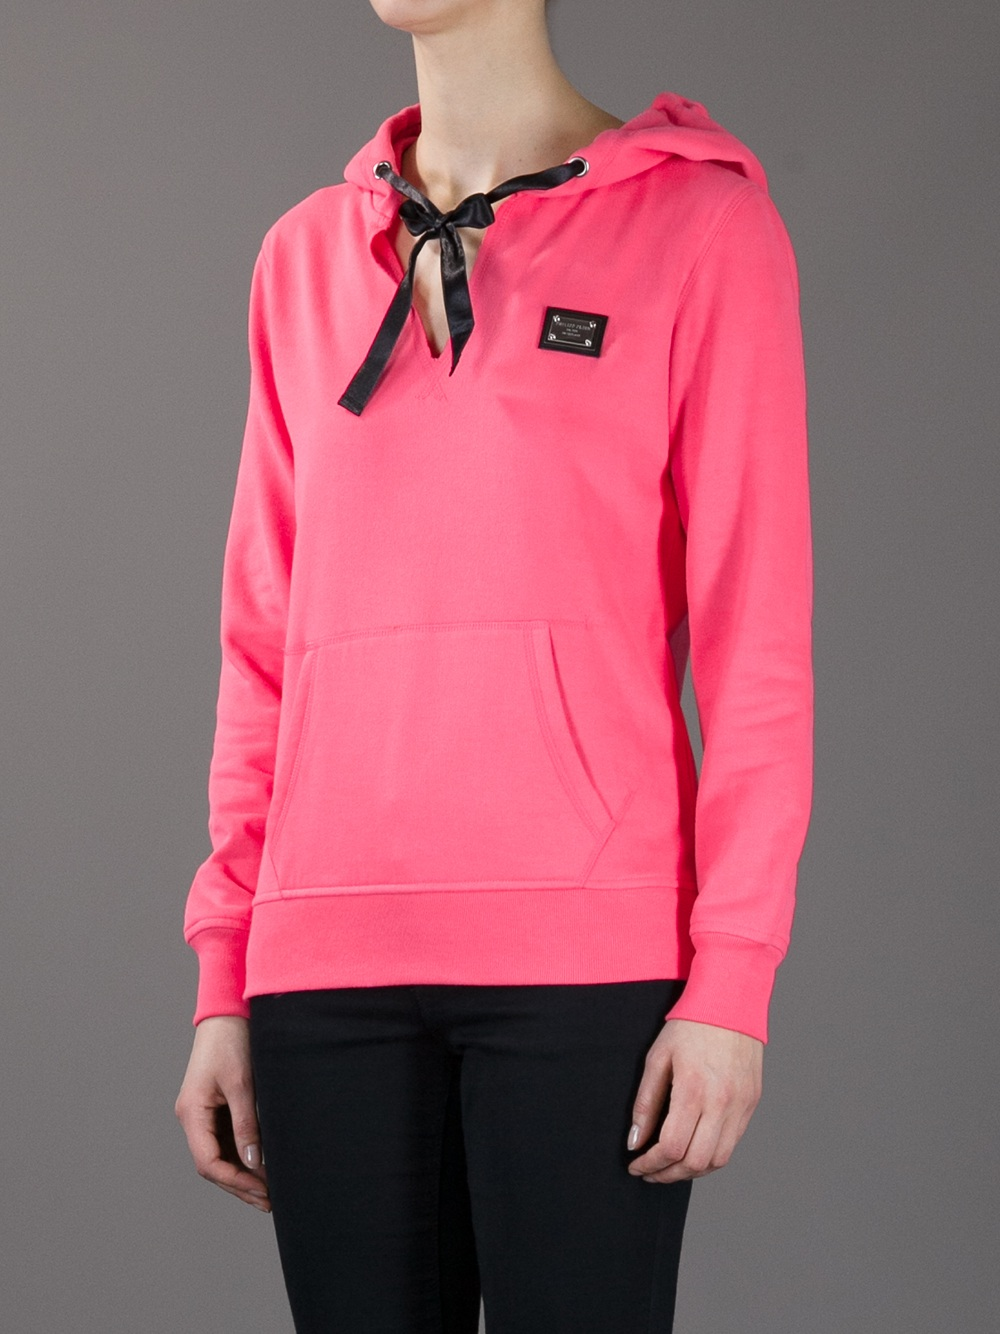 Philipp Plein Skull Embellished Hooded Sweatshirt in Pink